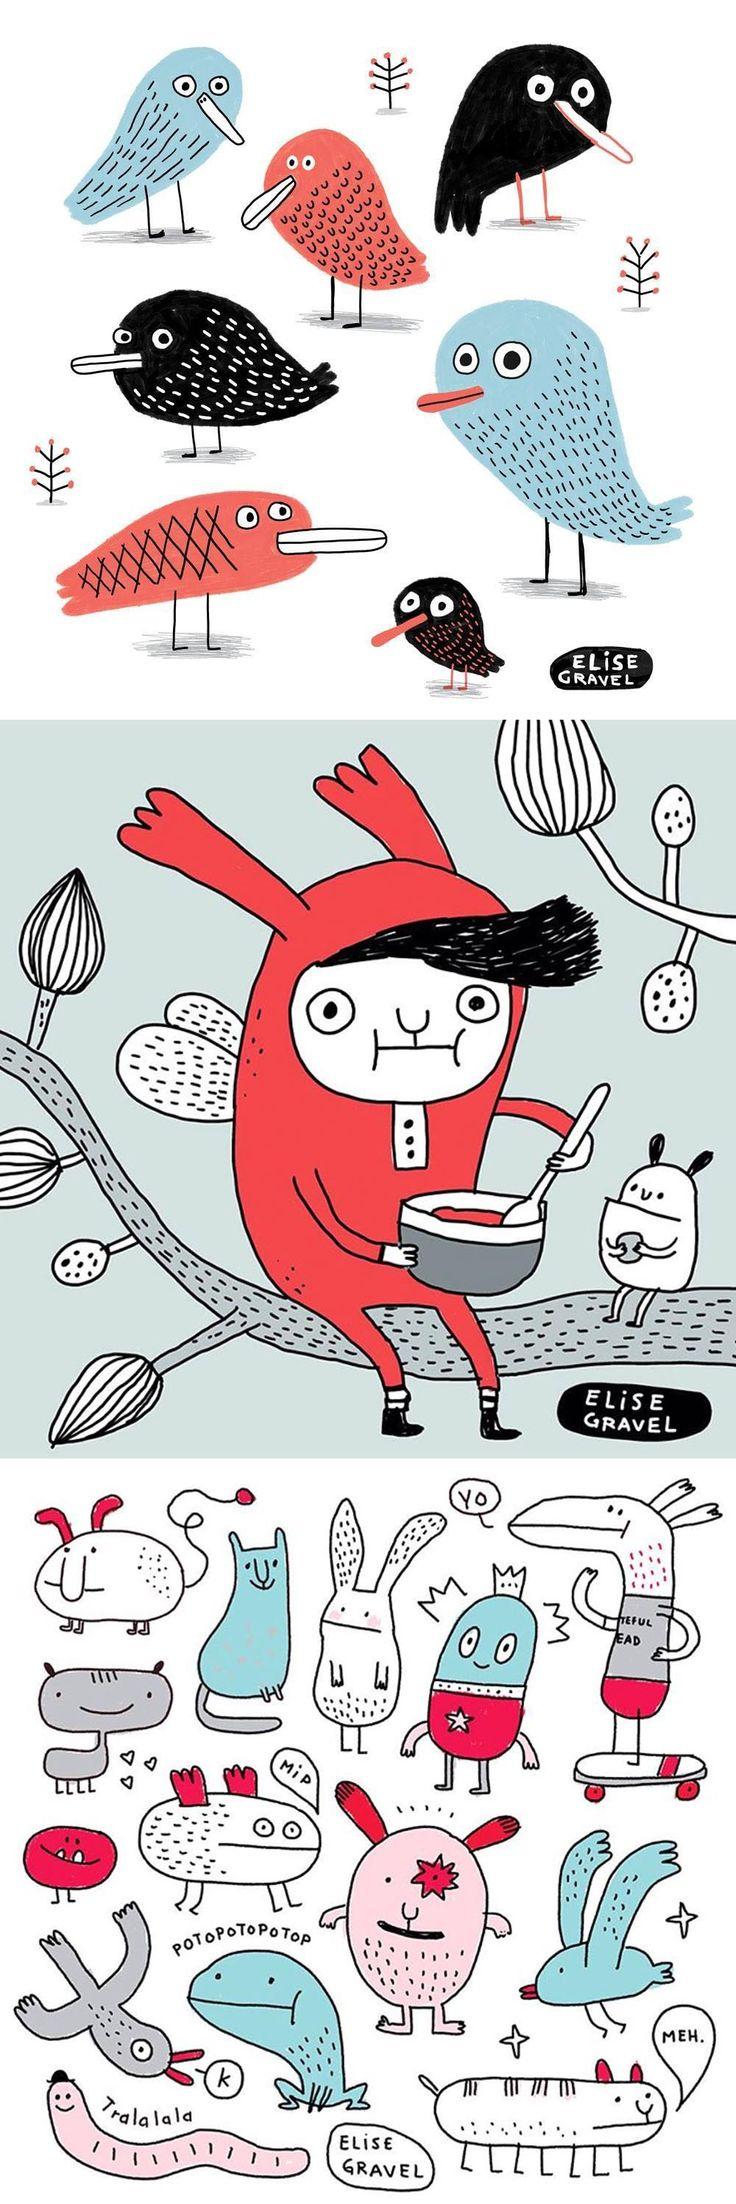 Elise Gravel Illustration • doodles • sketchbook • drawing • bird • character • monsters • cute • blue • red •